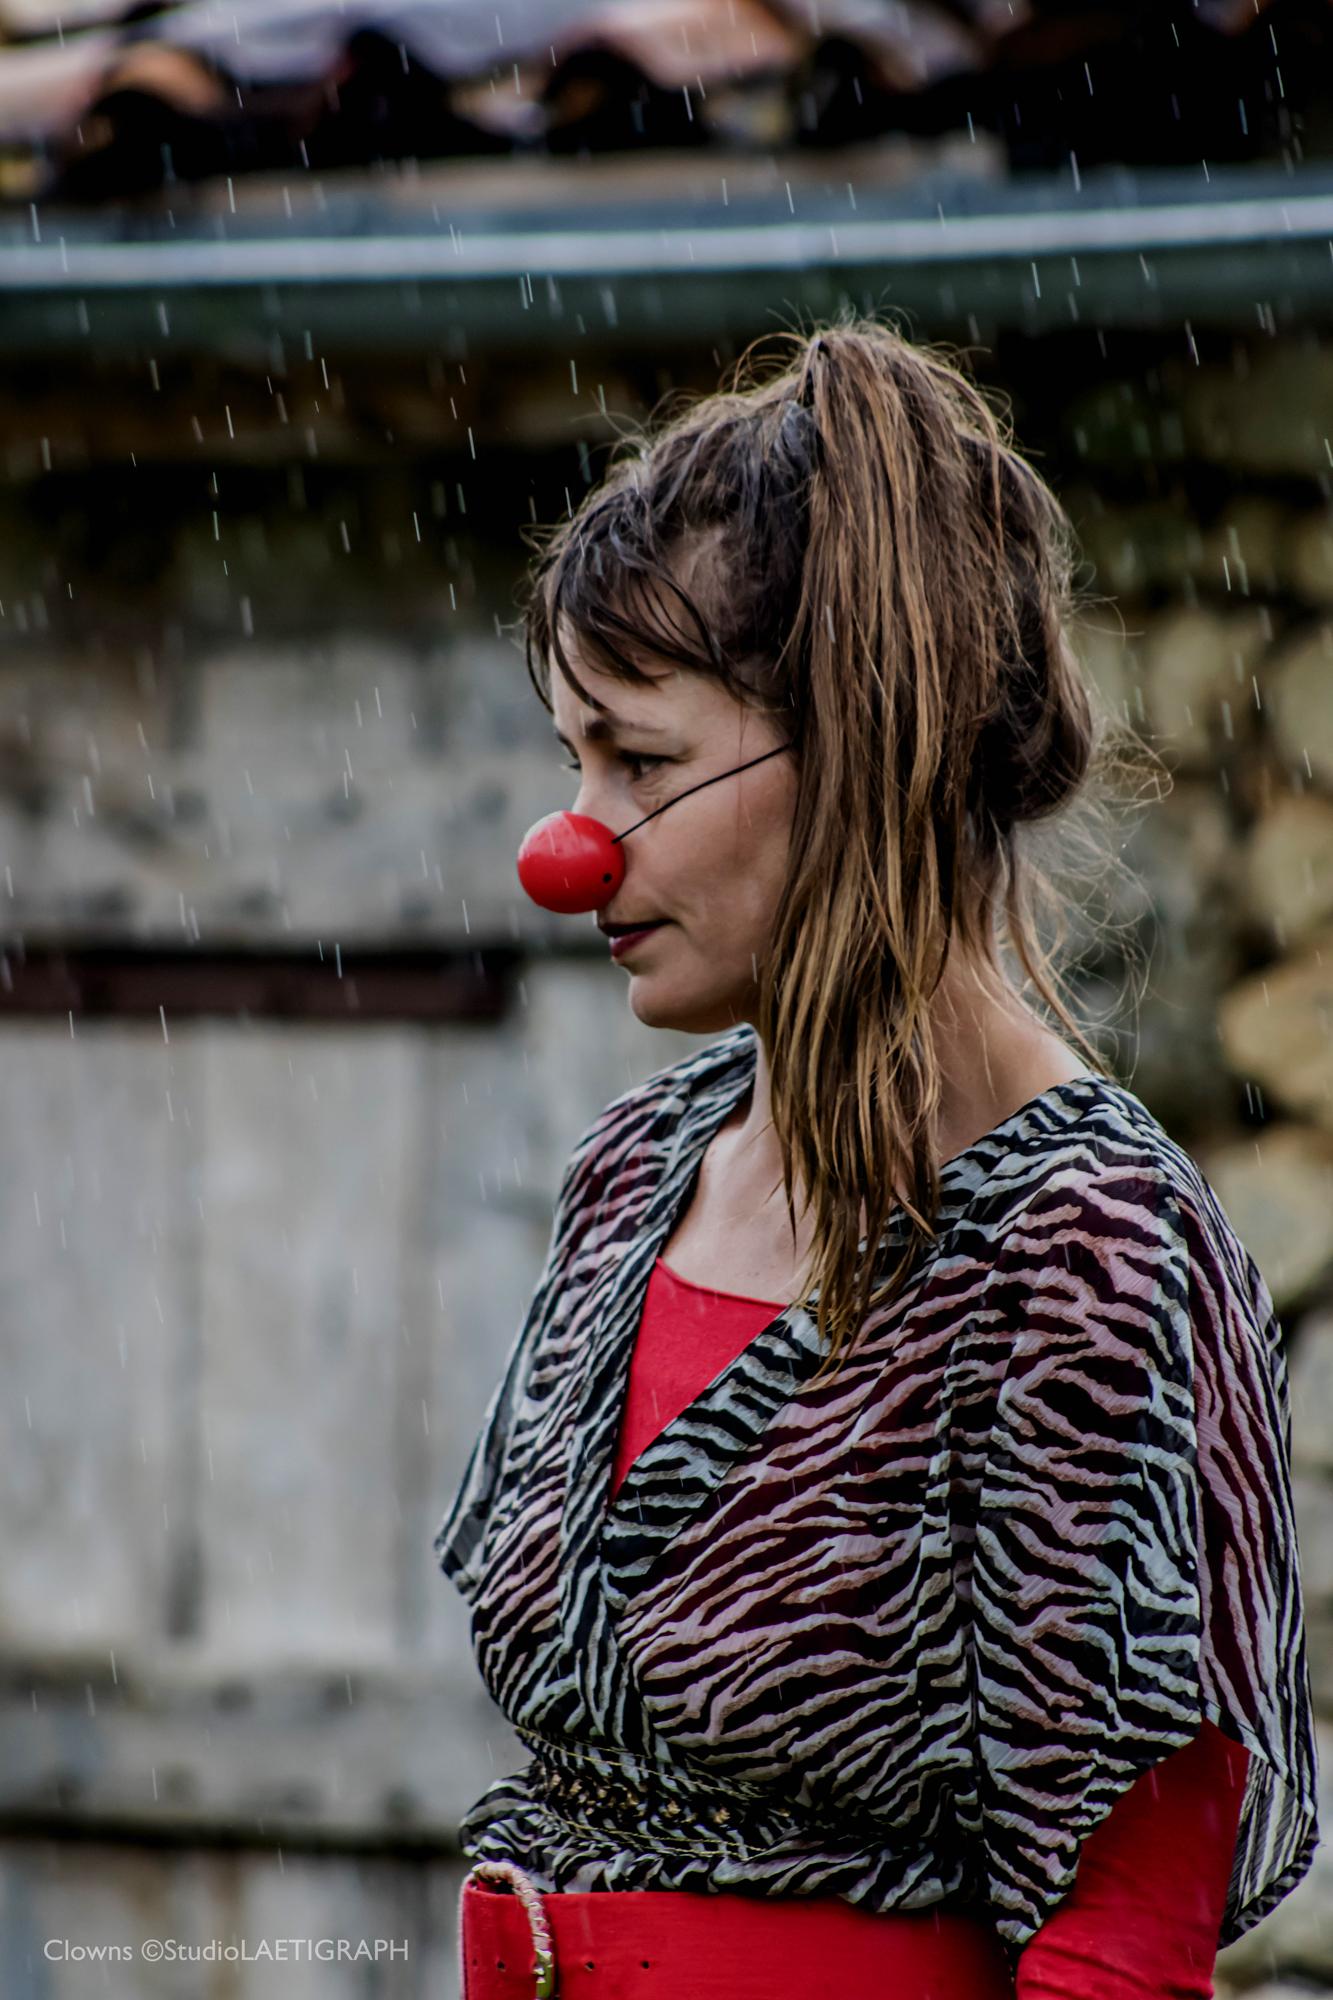 LMDCB21_clowns-27_1